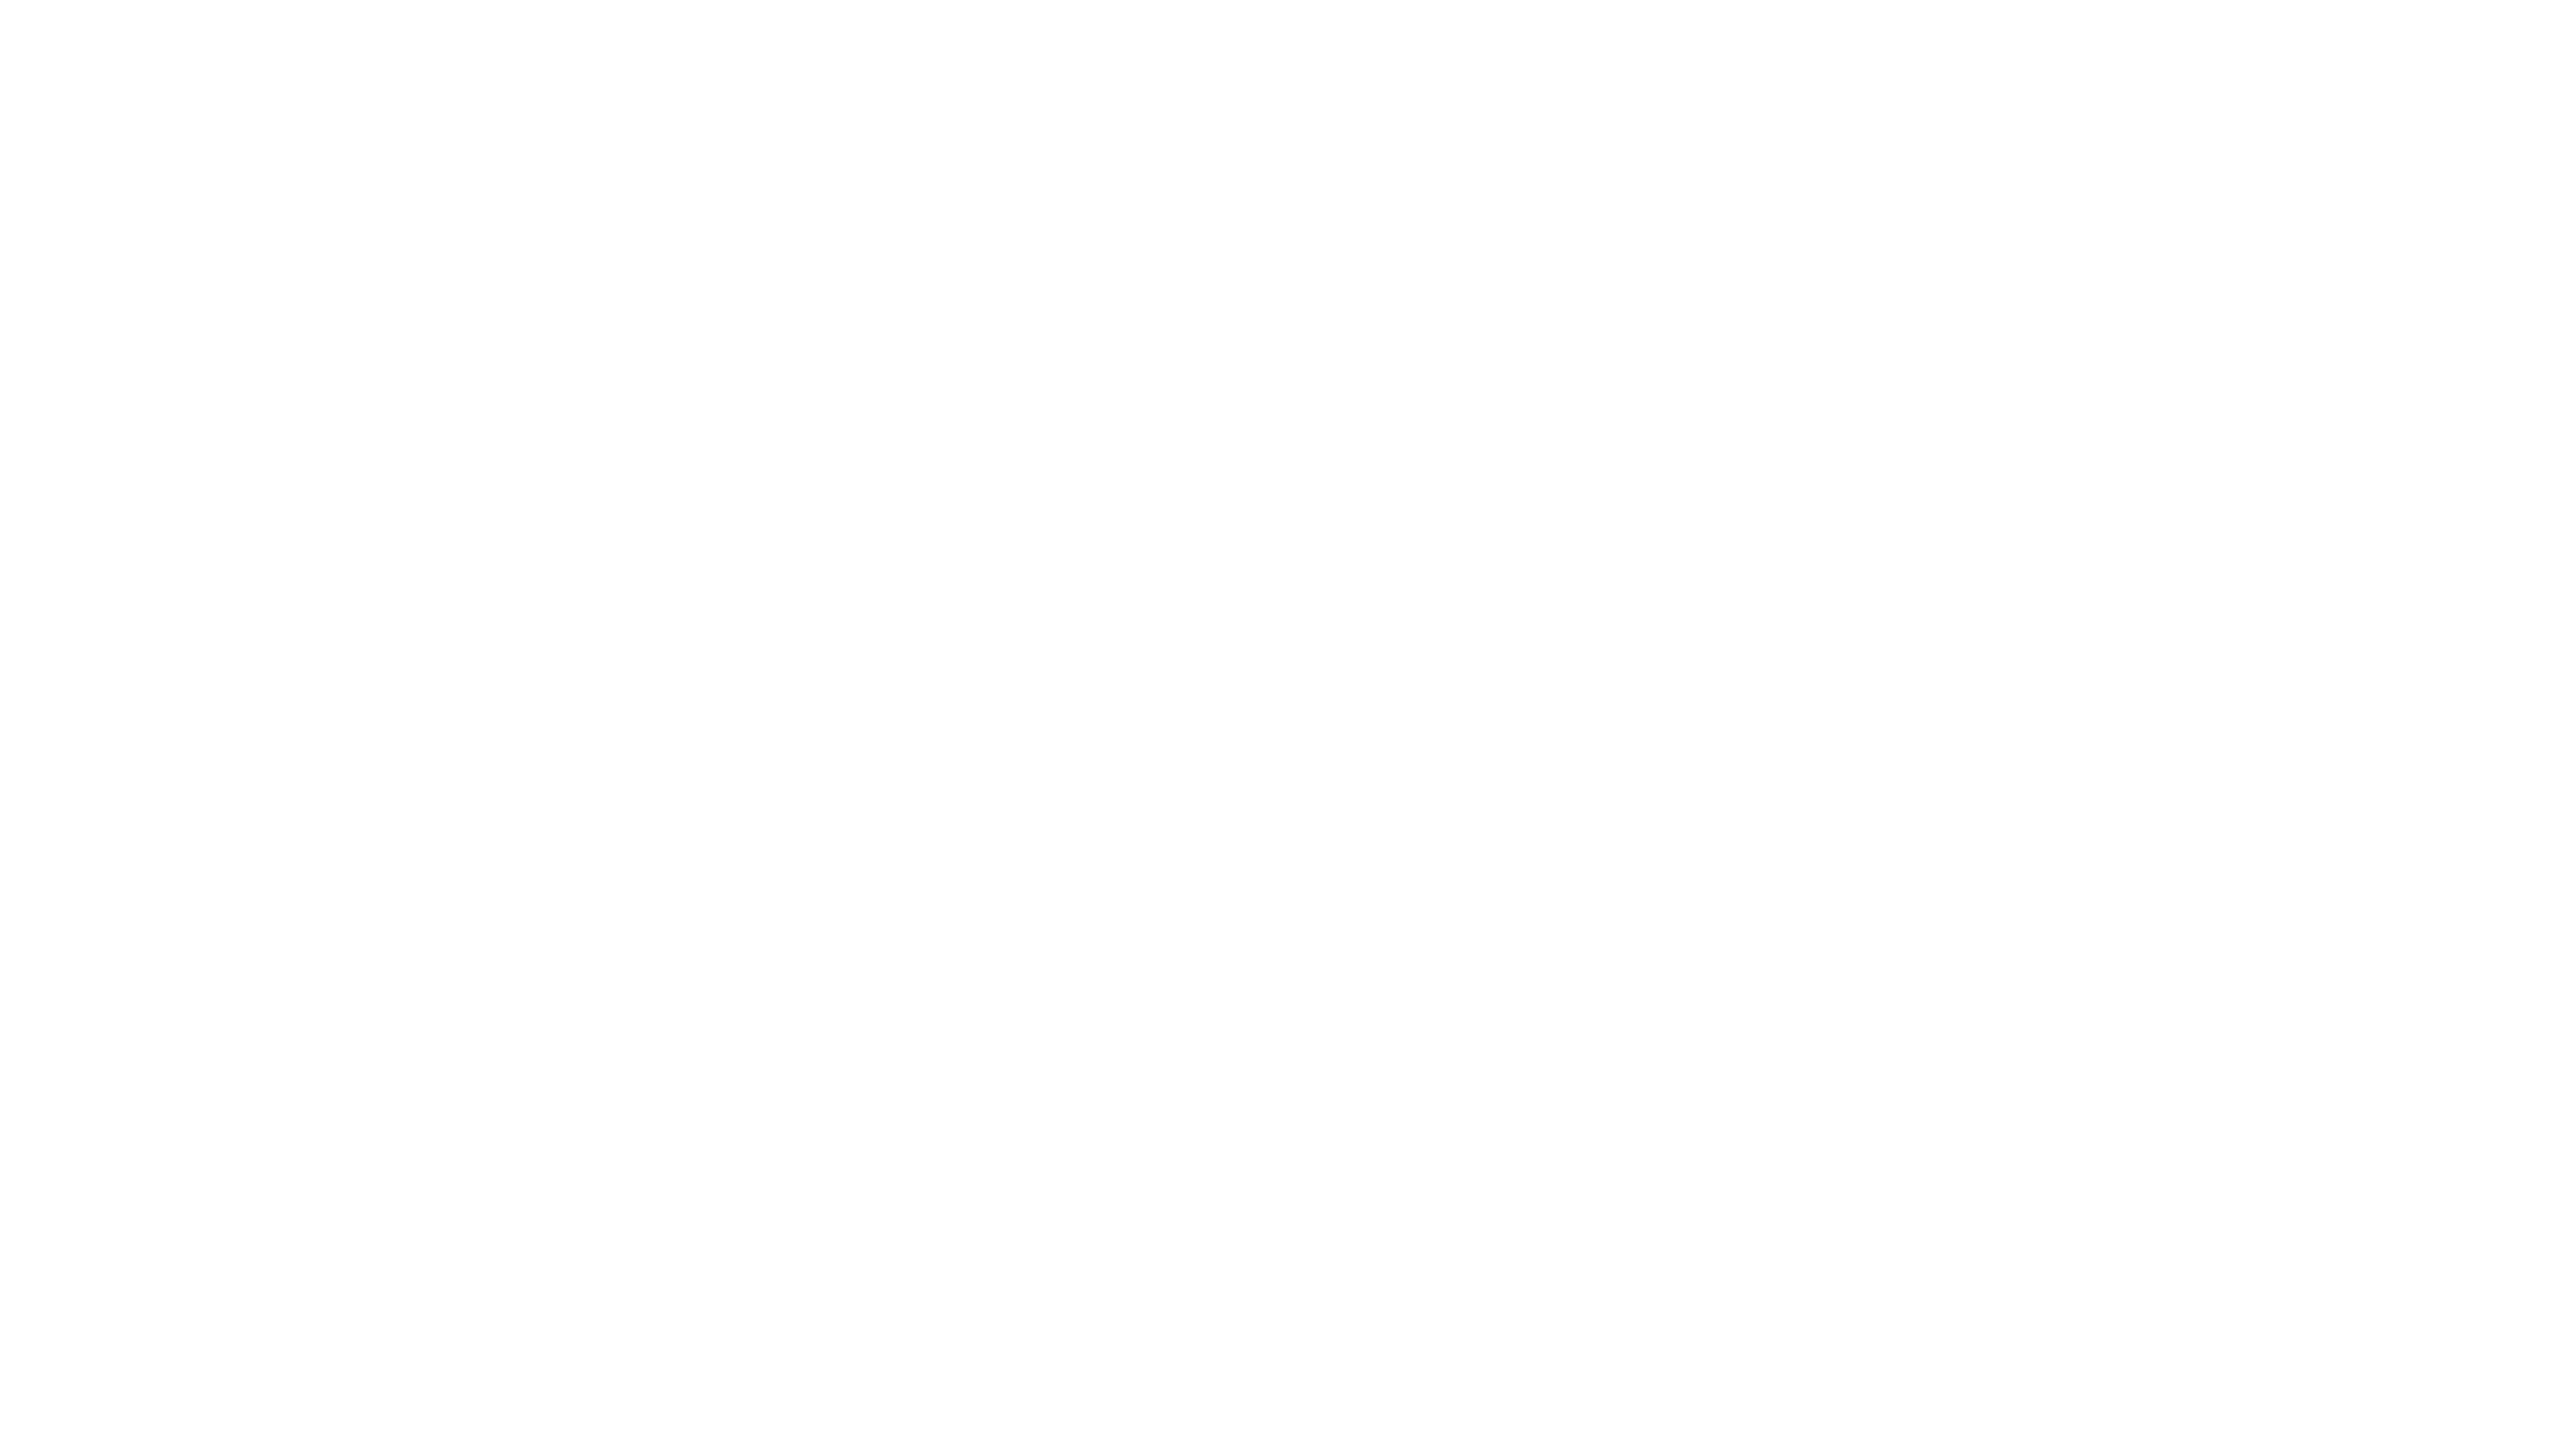 fruit punch logo handrawn